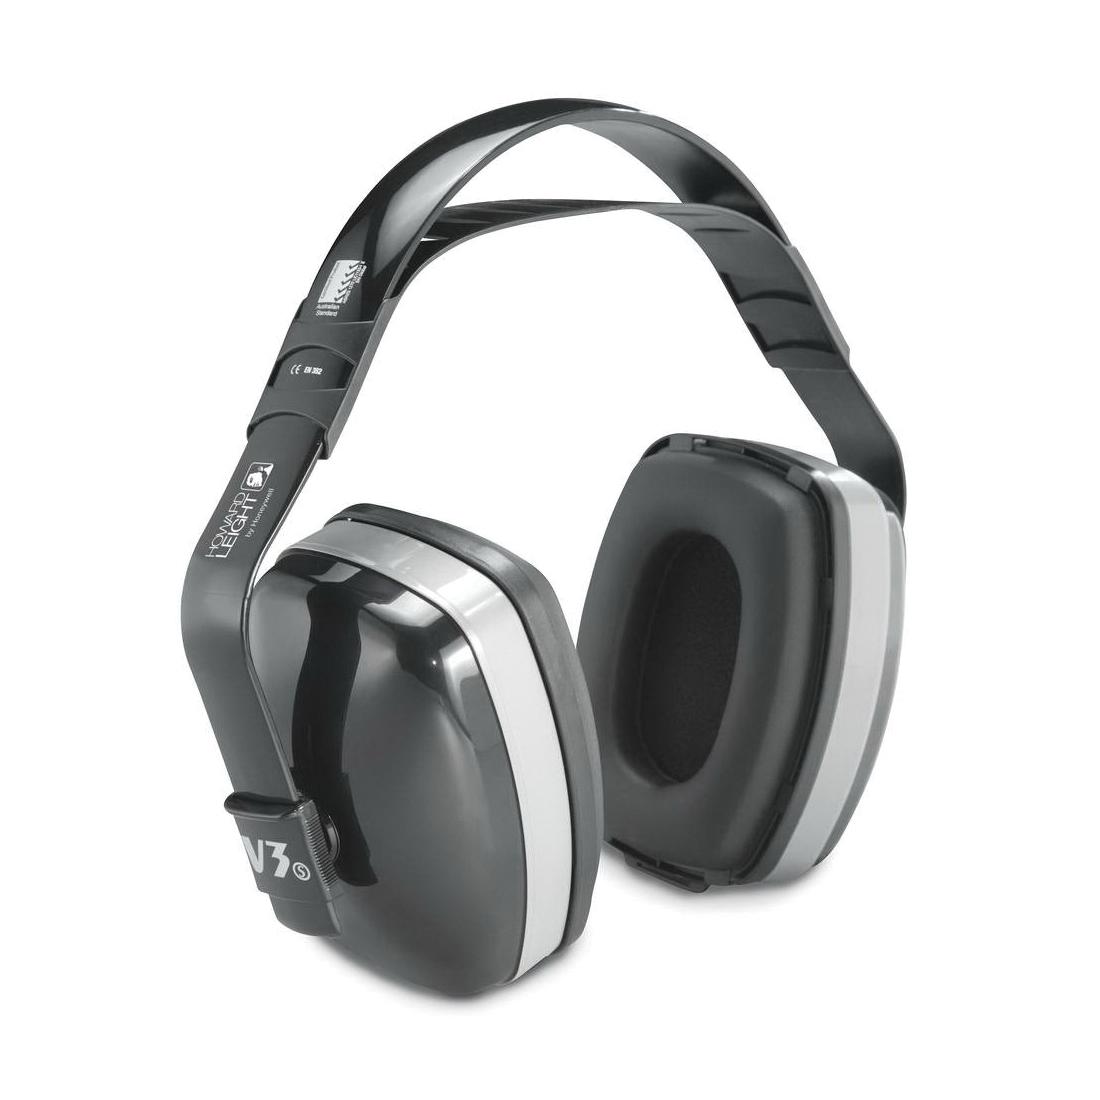 Howard Leight by Honeywell 1010926 Viking® V2 Earmuffs, 27 dB Noise Reduction, Black/Blue, Multi-Position Band Position, ANSI S3.19-1974